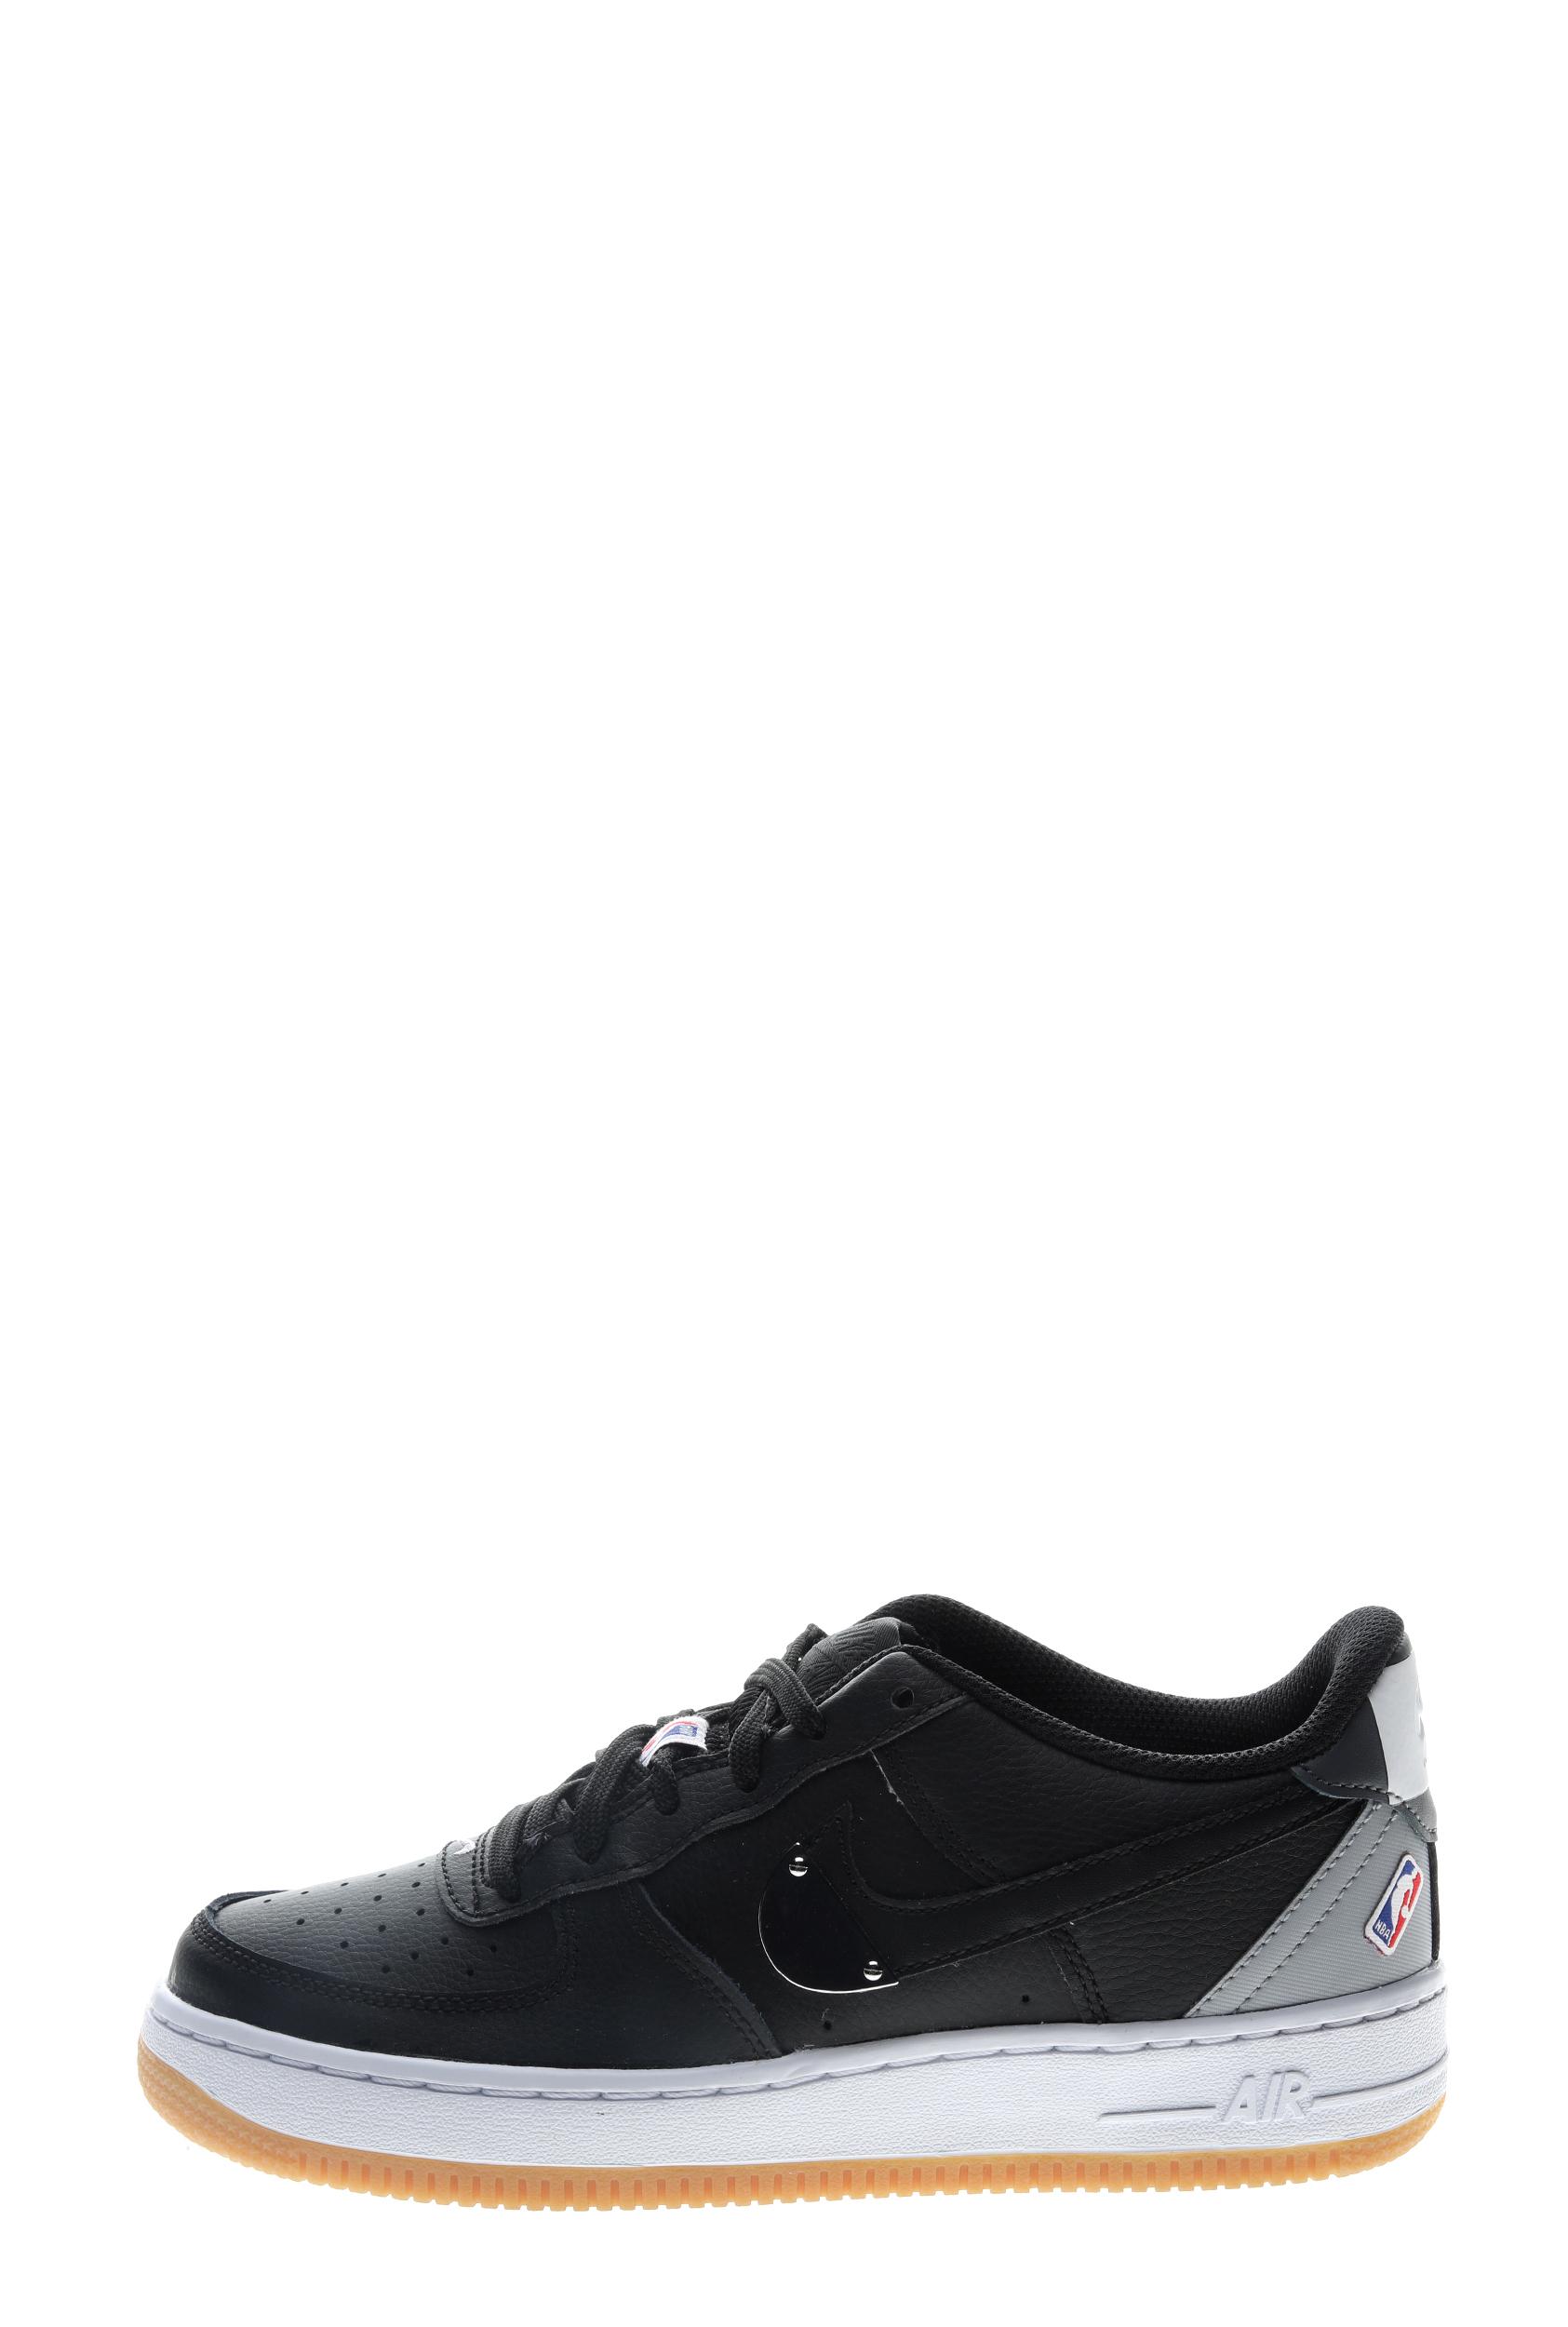 NIKE – Παιδικά sneakers NIKE AIR FORCE 1 LV8 1 HO20 (GS) μαύρα γκρι